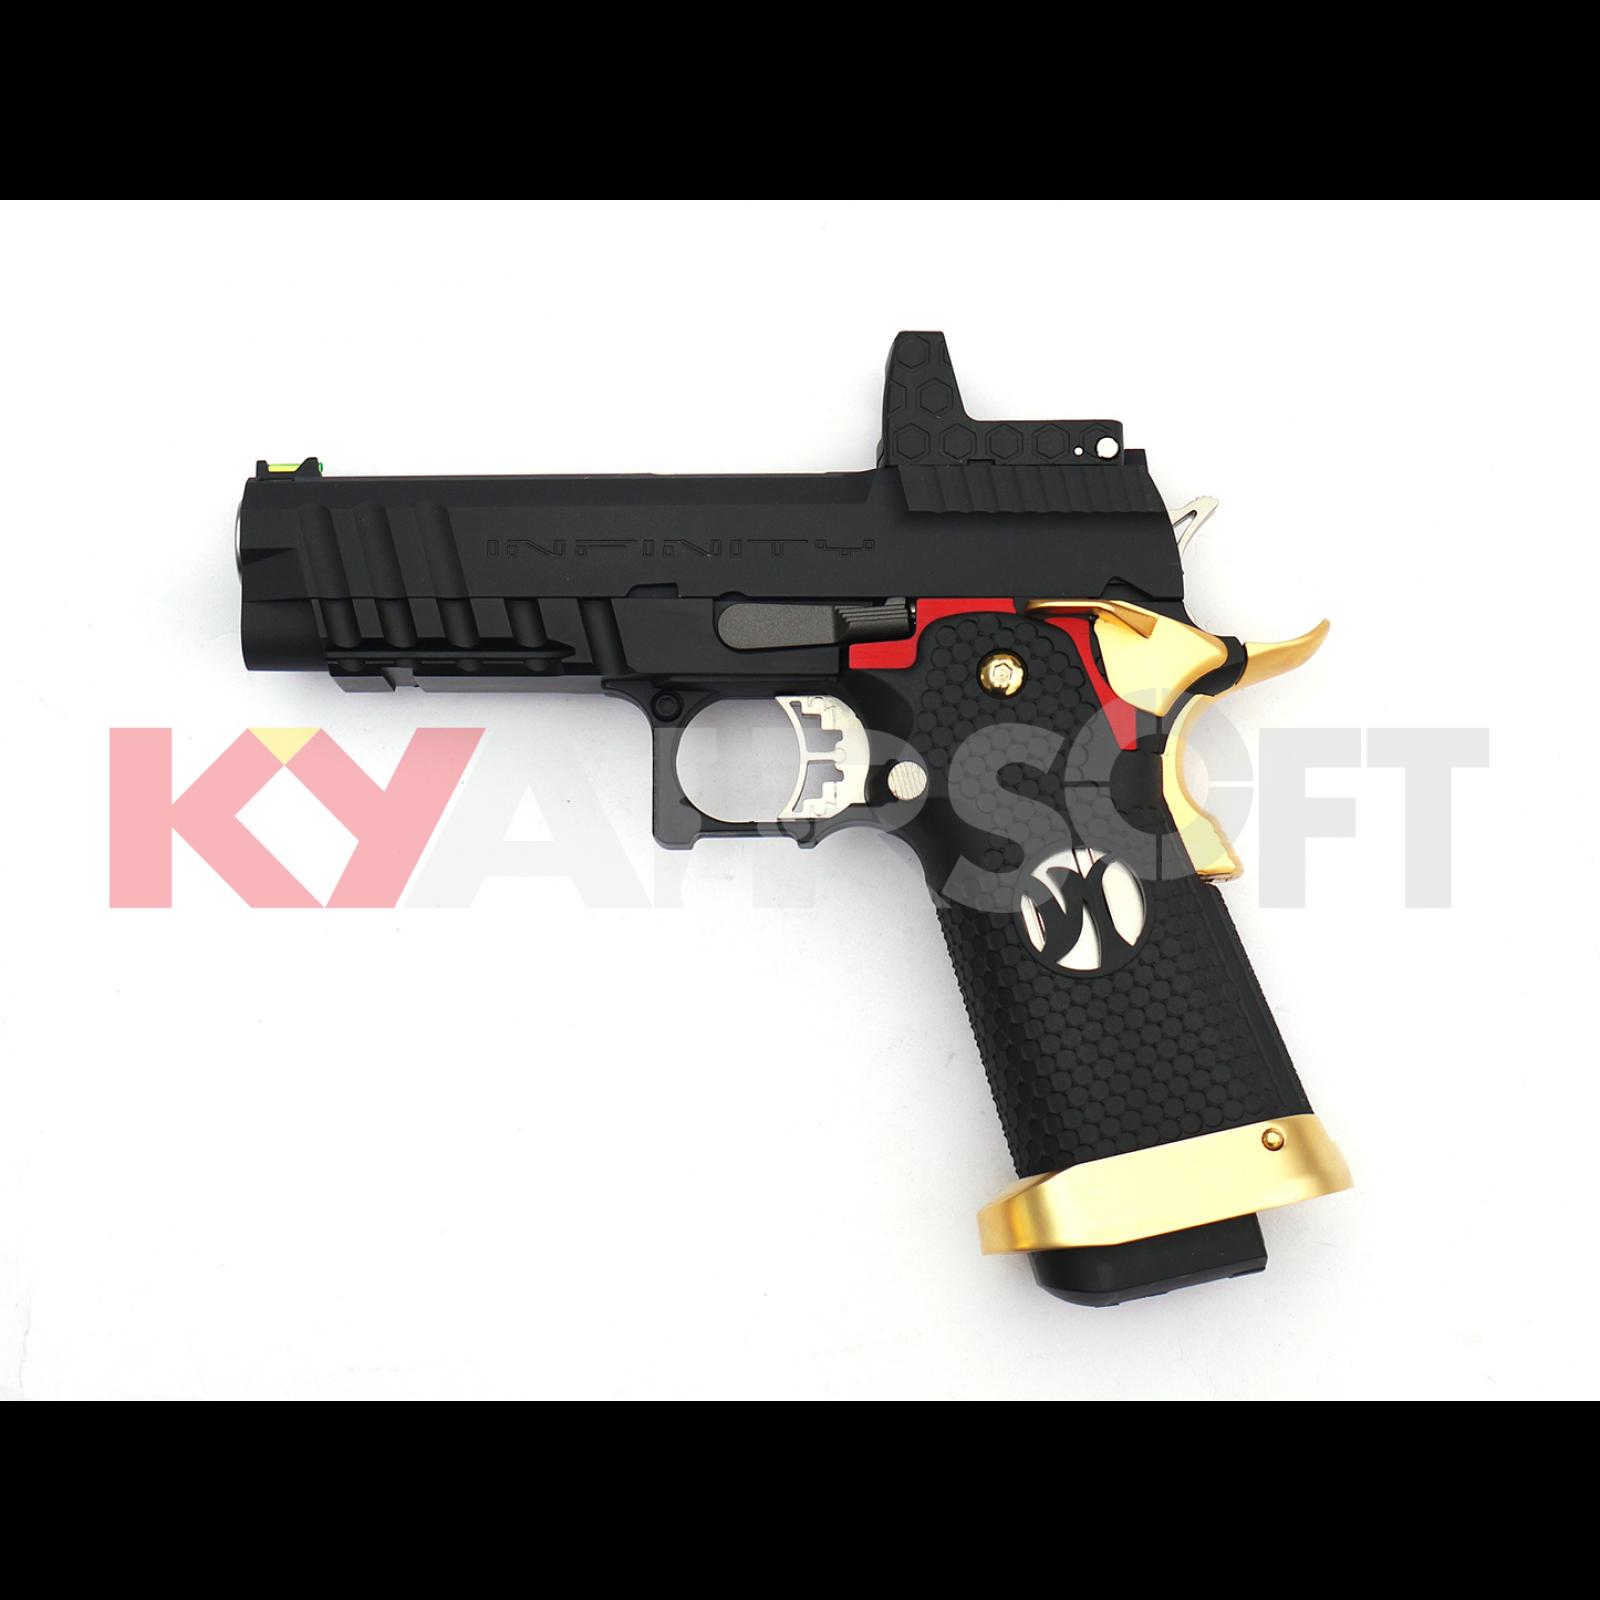 HX2601 Full marking - KY WORKSHOP ( CNC Marking Product - WE / AW